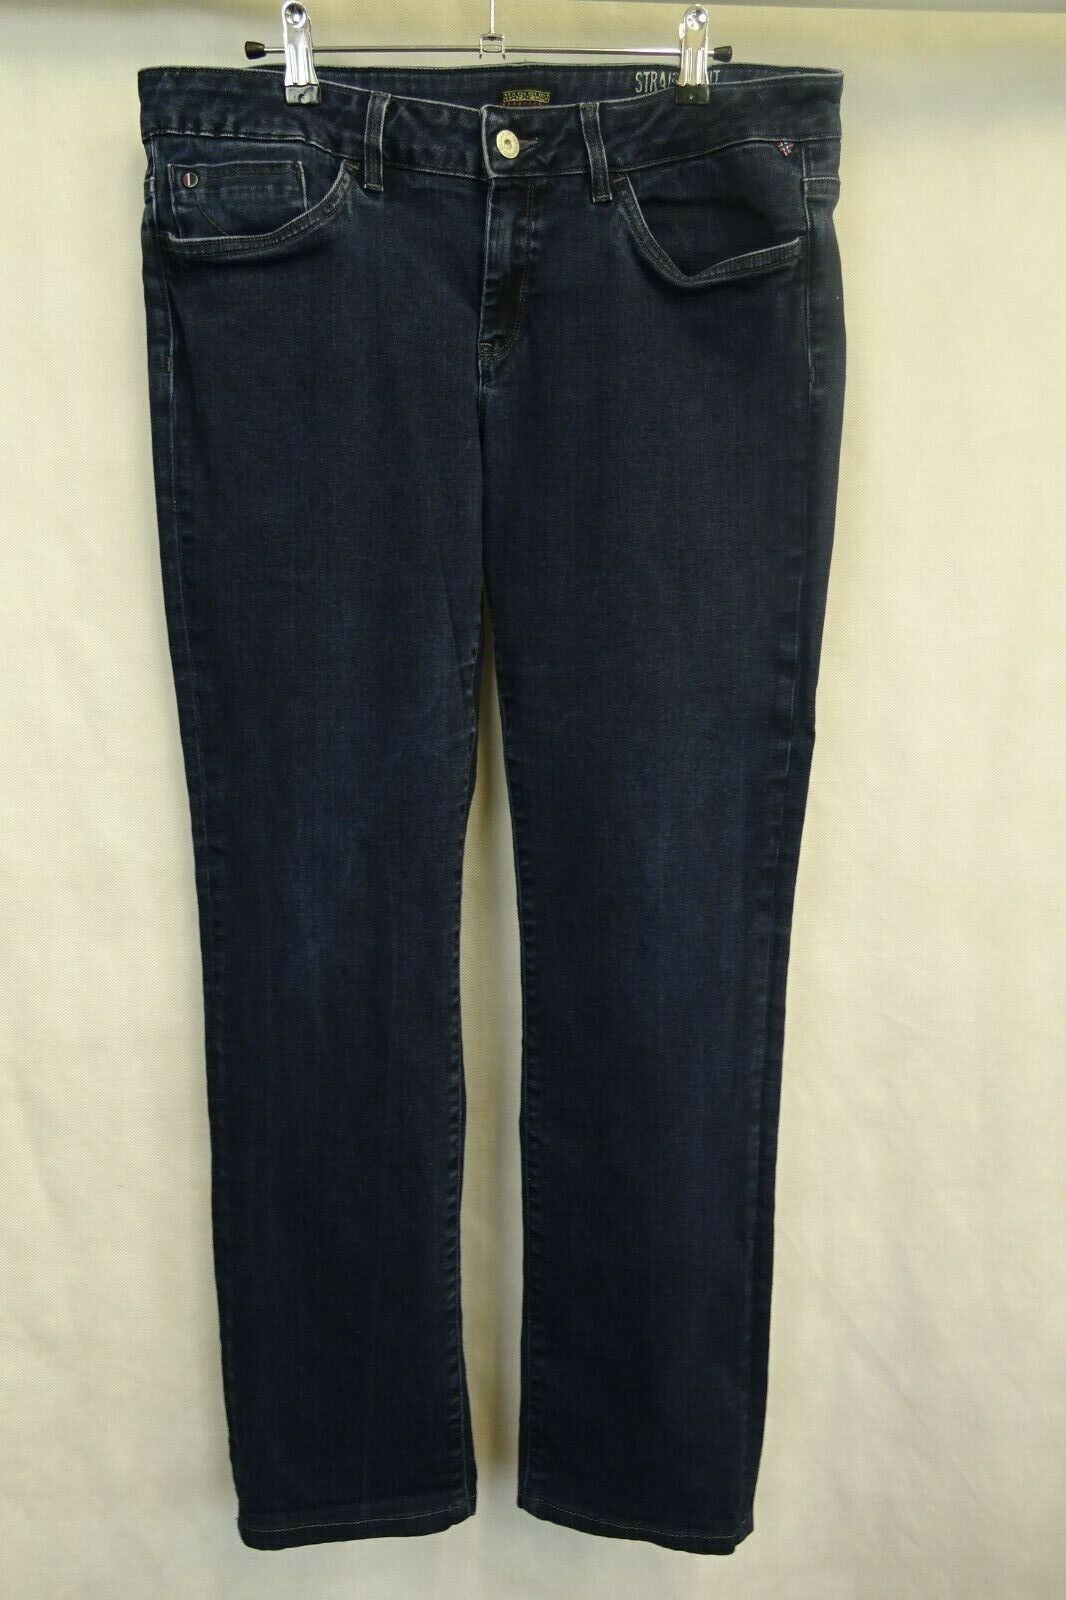 Woherren Napapijri Geographic Jeans Pants Trousers W34 L30